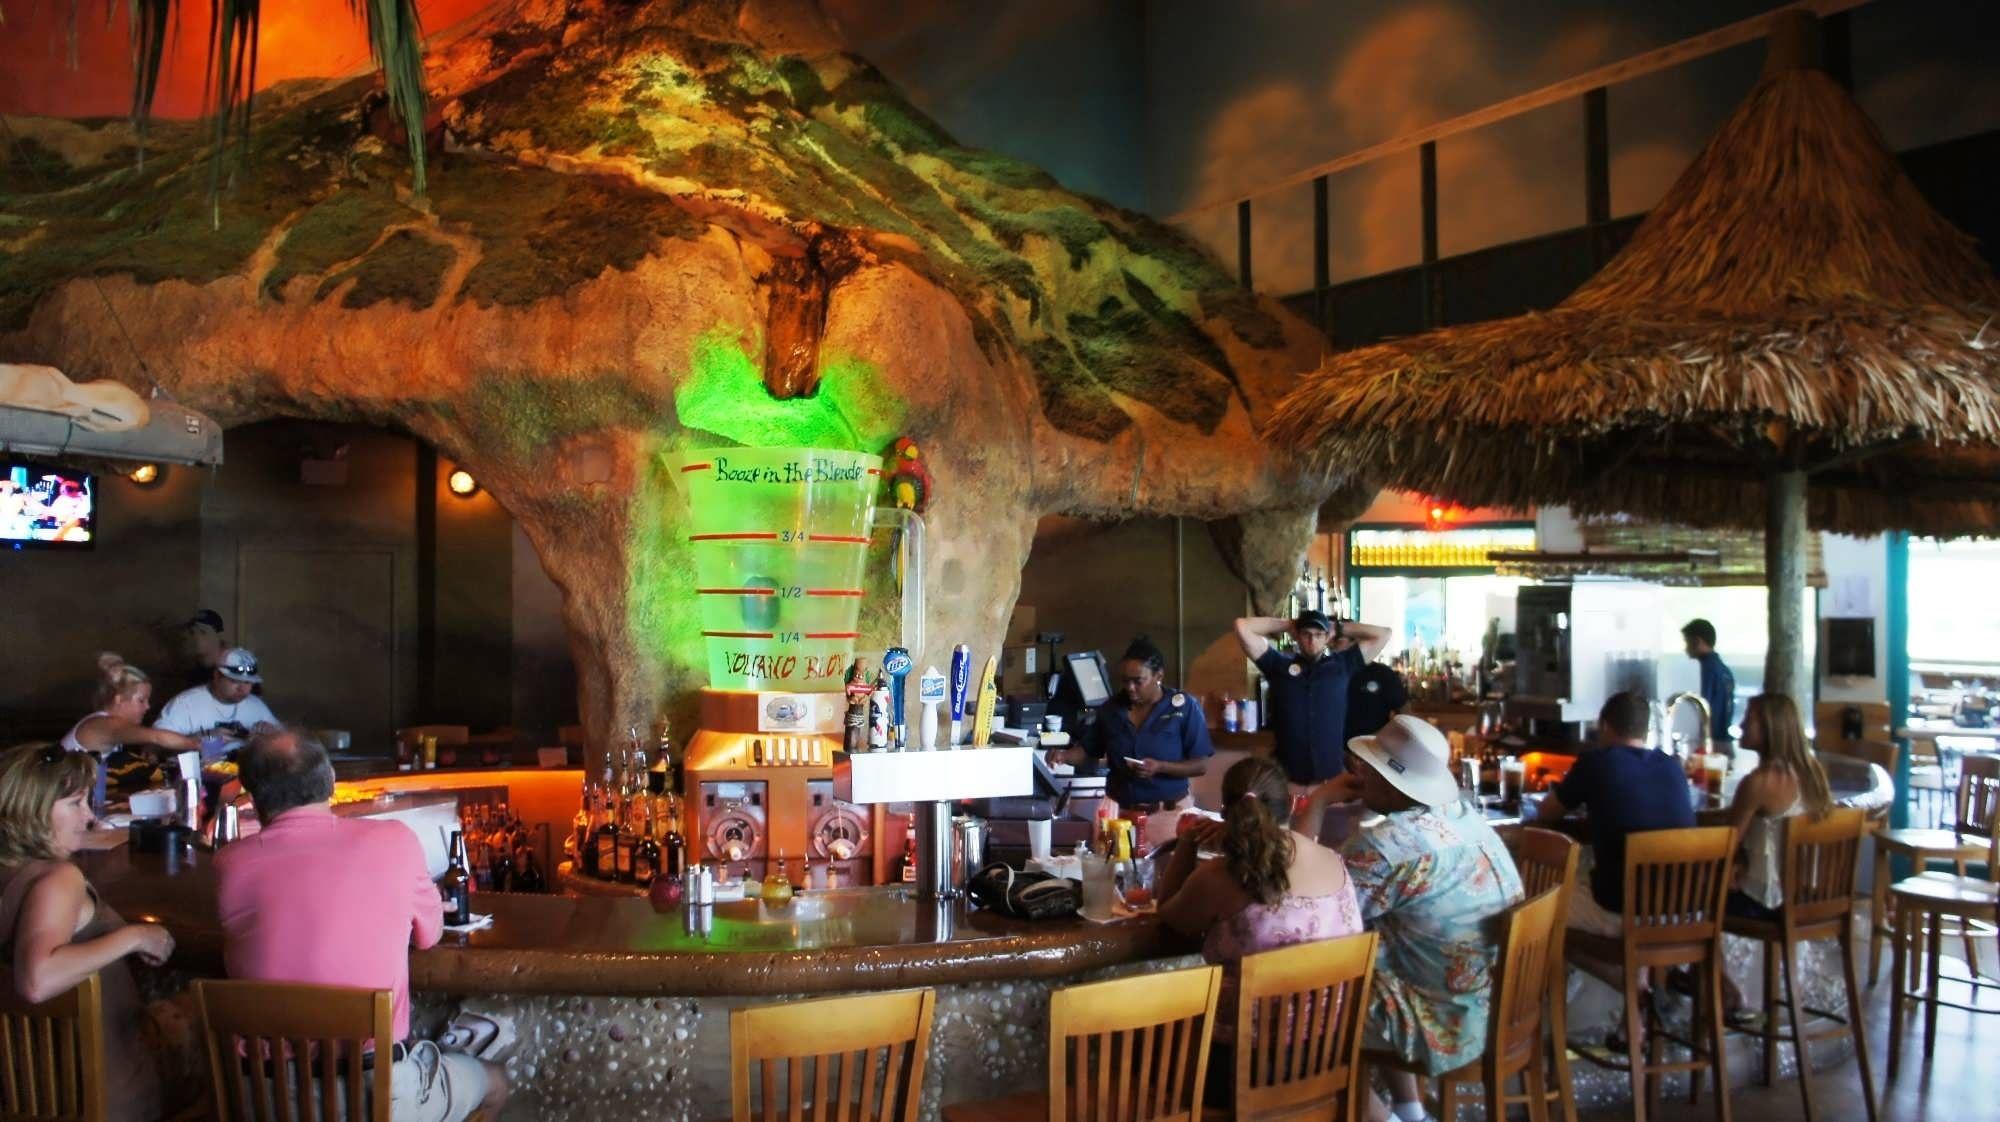 Margaritaville orlando store / All inclusive honeymoon resorts mexico